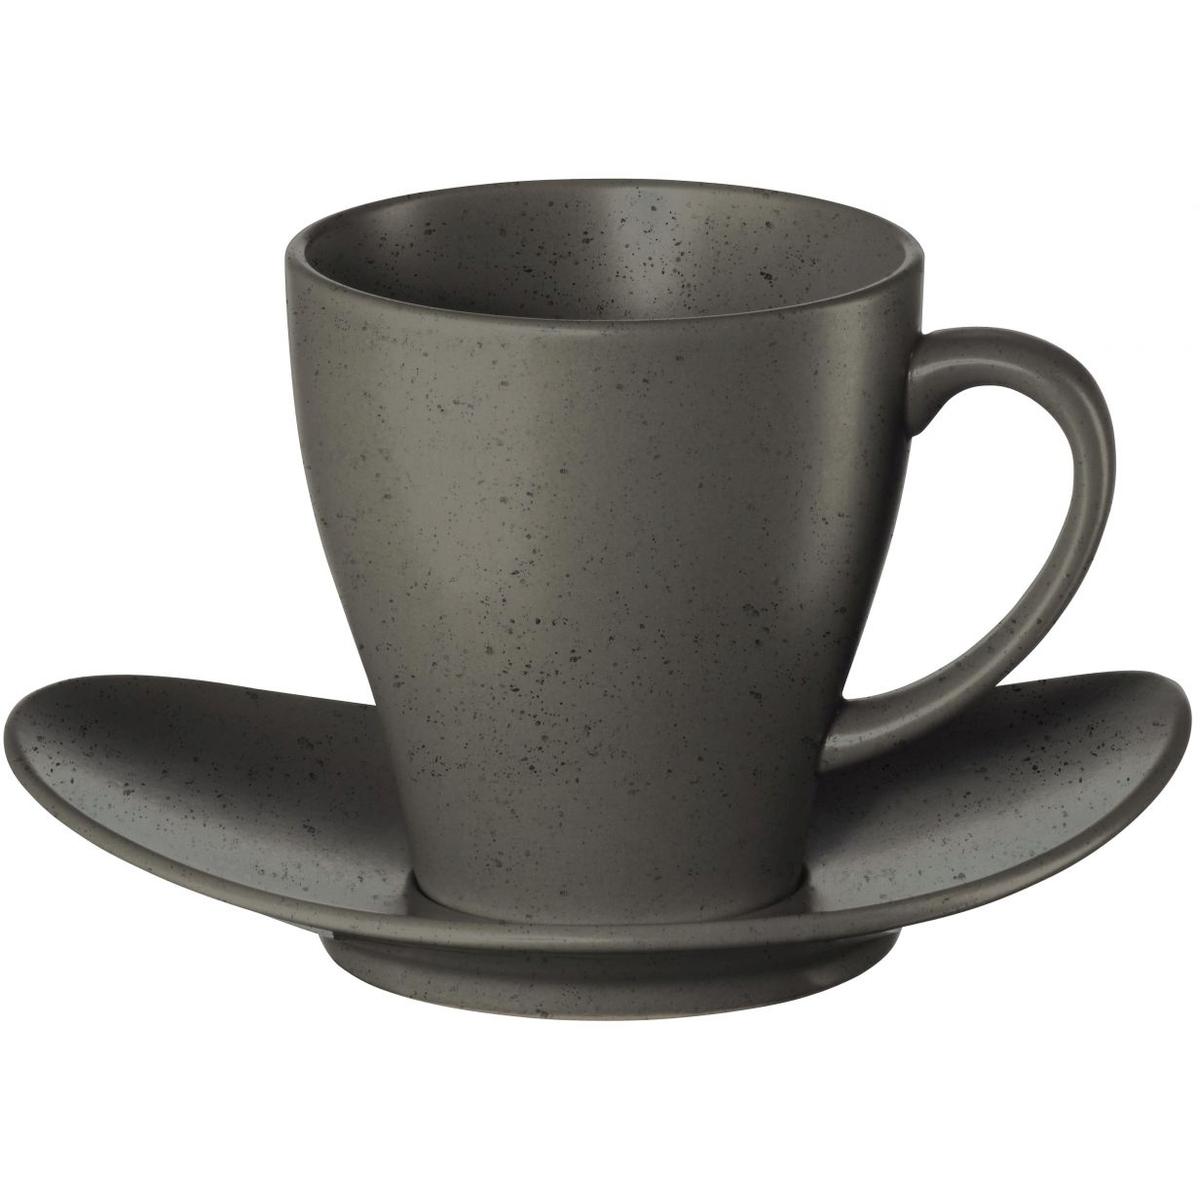 Фото - Чашка с блюдцем Asa selection cuba чашка с блюдцем 210мл серый asa selection